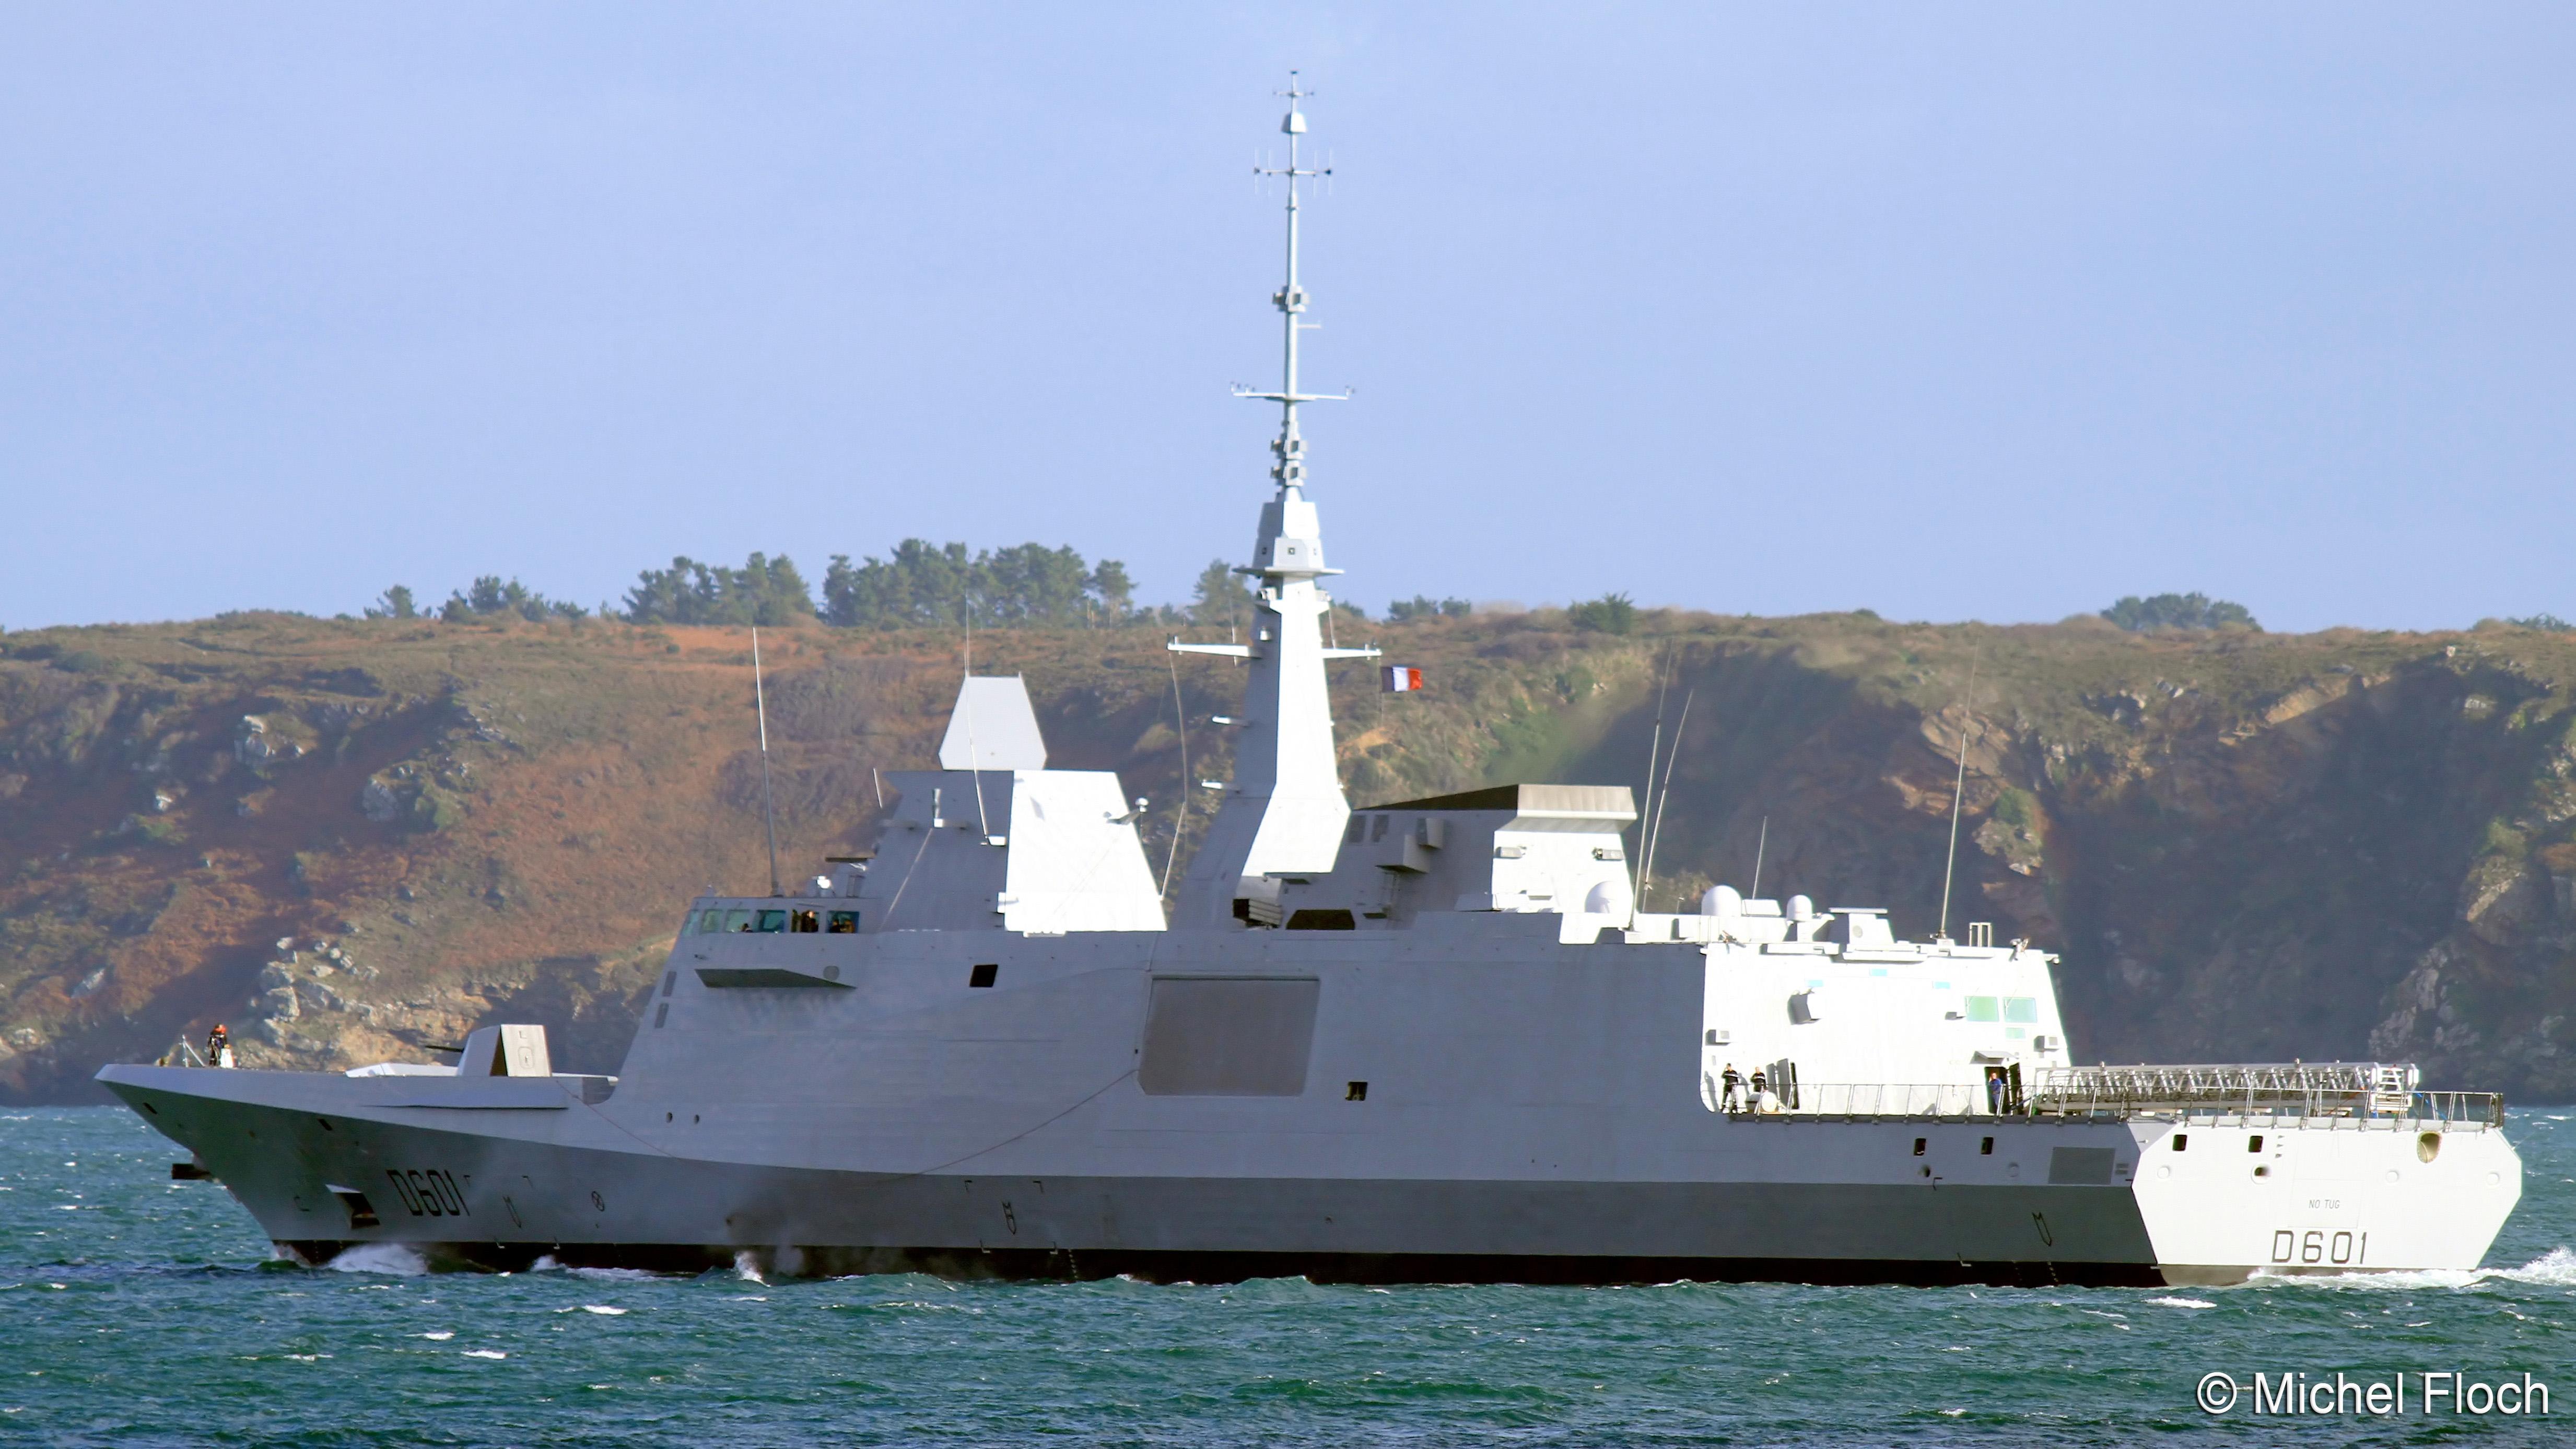 Royal Moroccan Navy FREMM Destroyer FREMM Marocaine - Mohammed VI 10885943576_478c94ec96_o